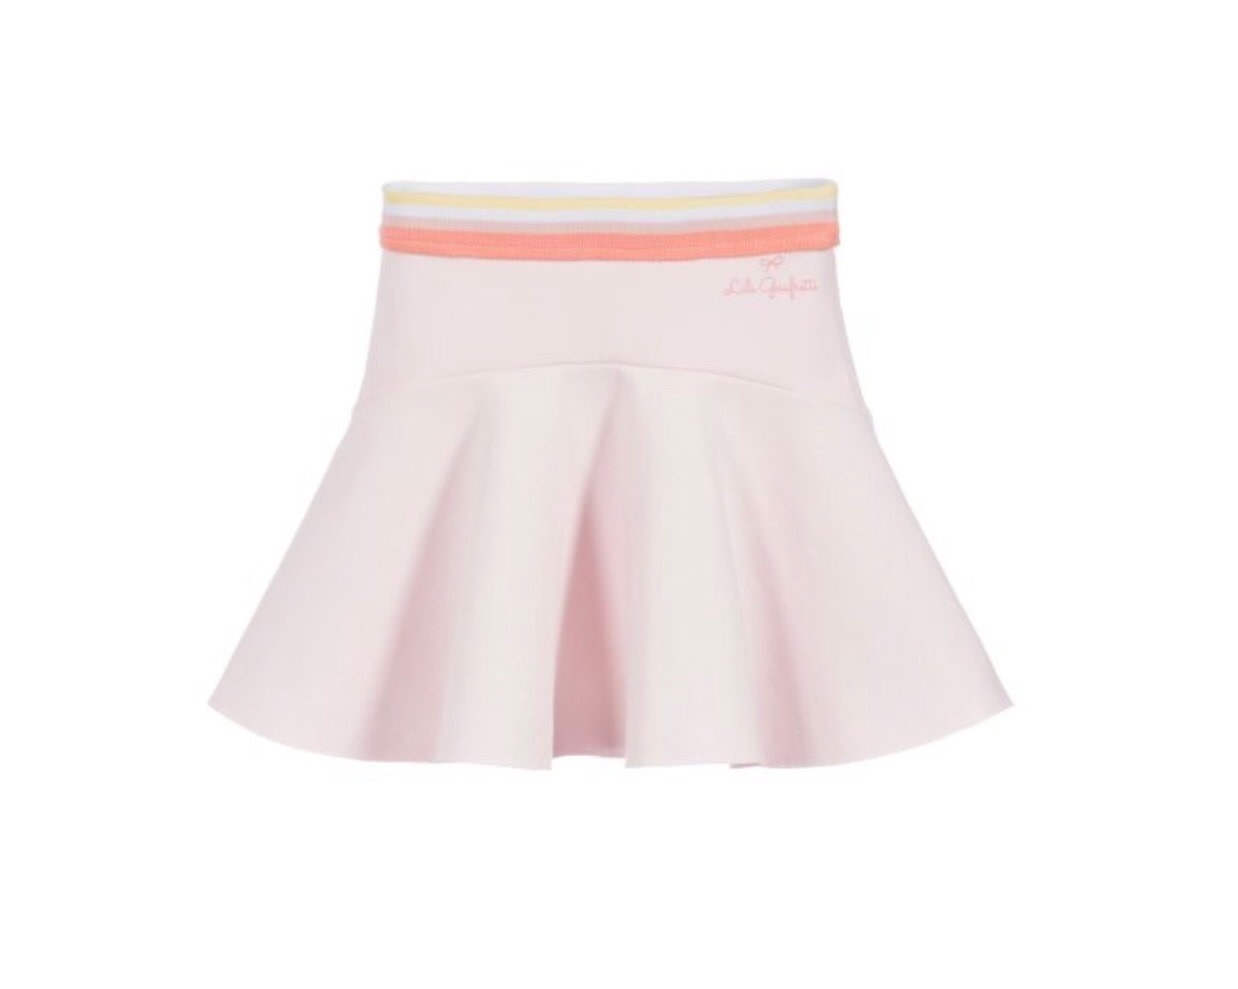 Lili Gaufrette 27022 Pink Skirt